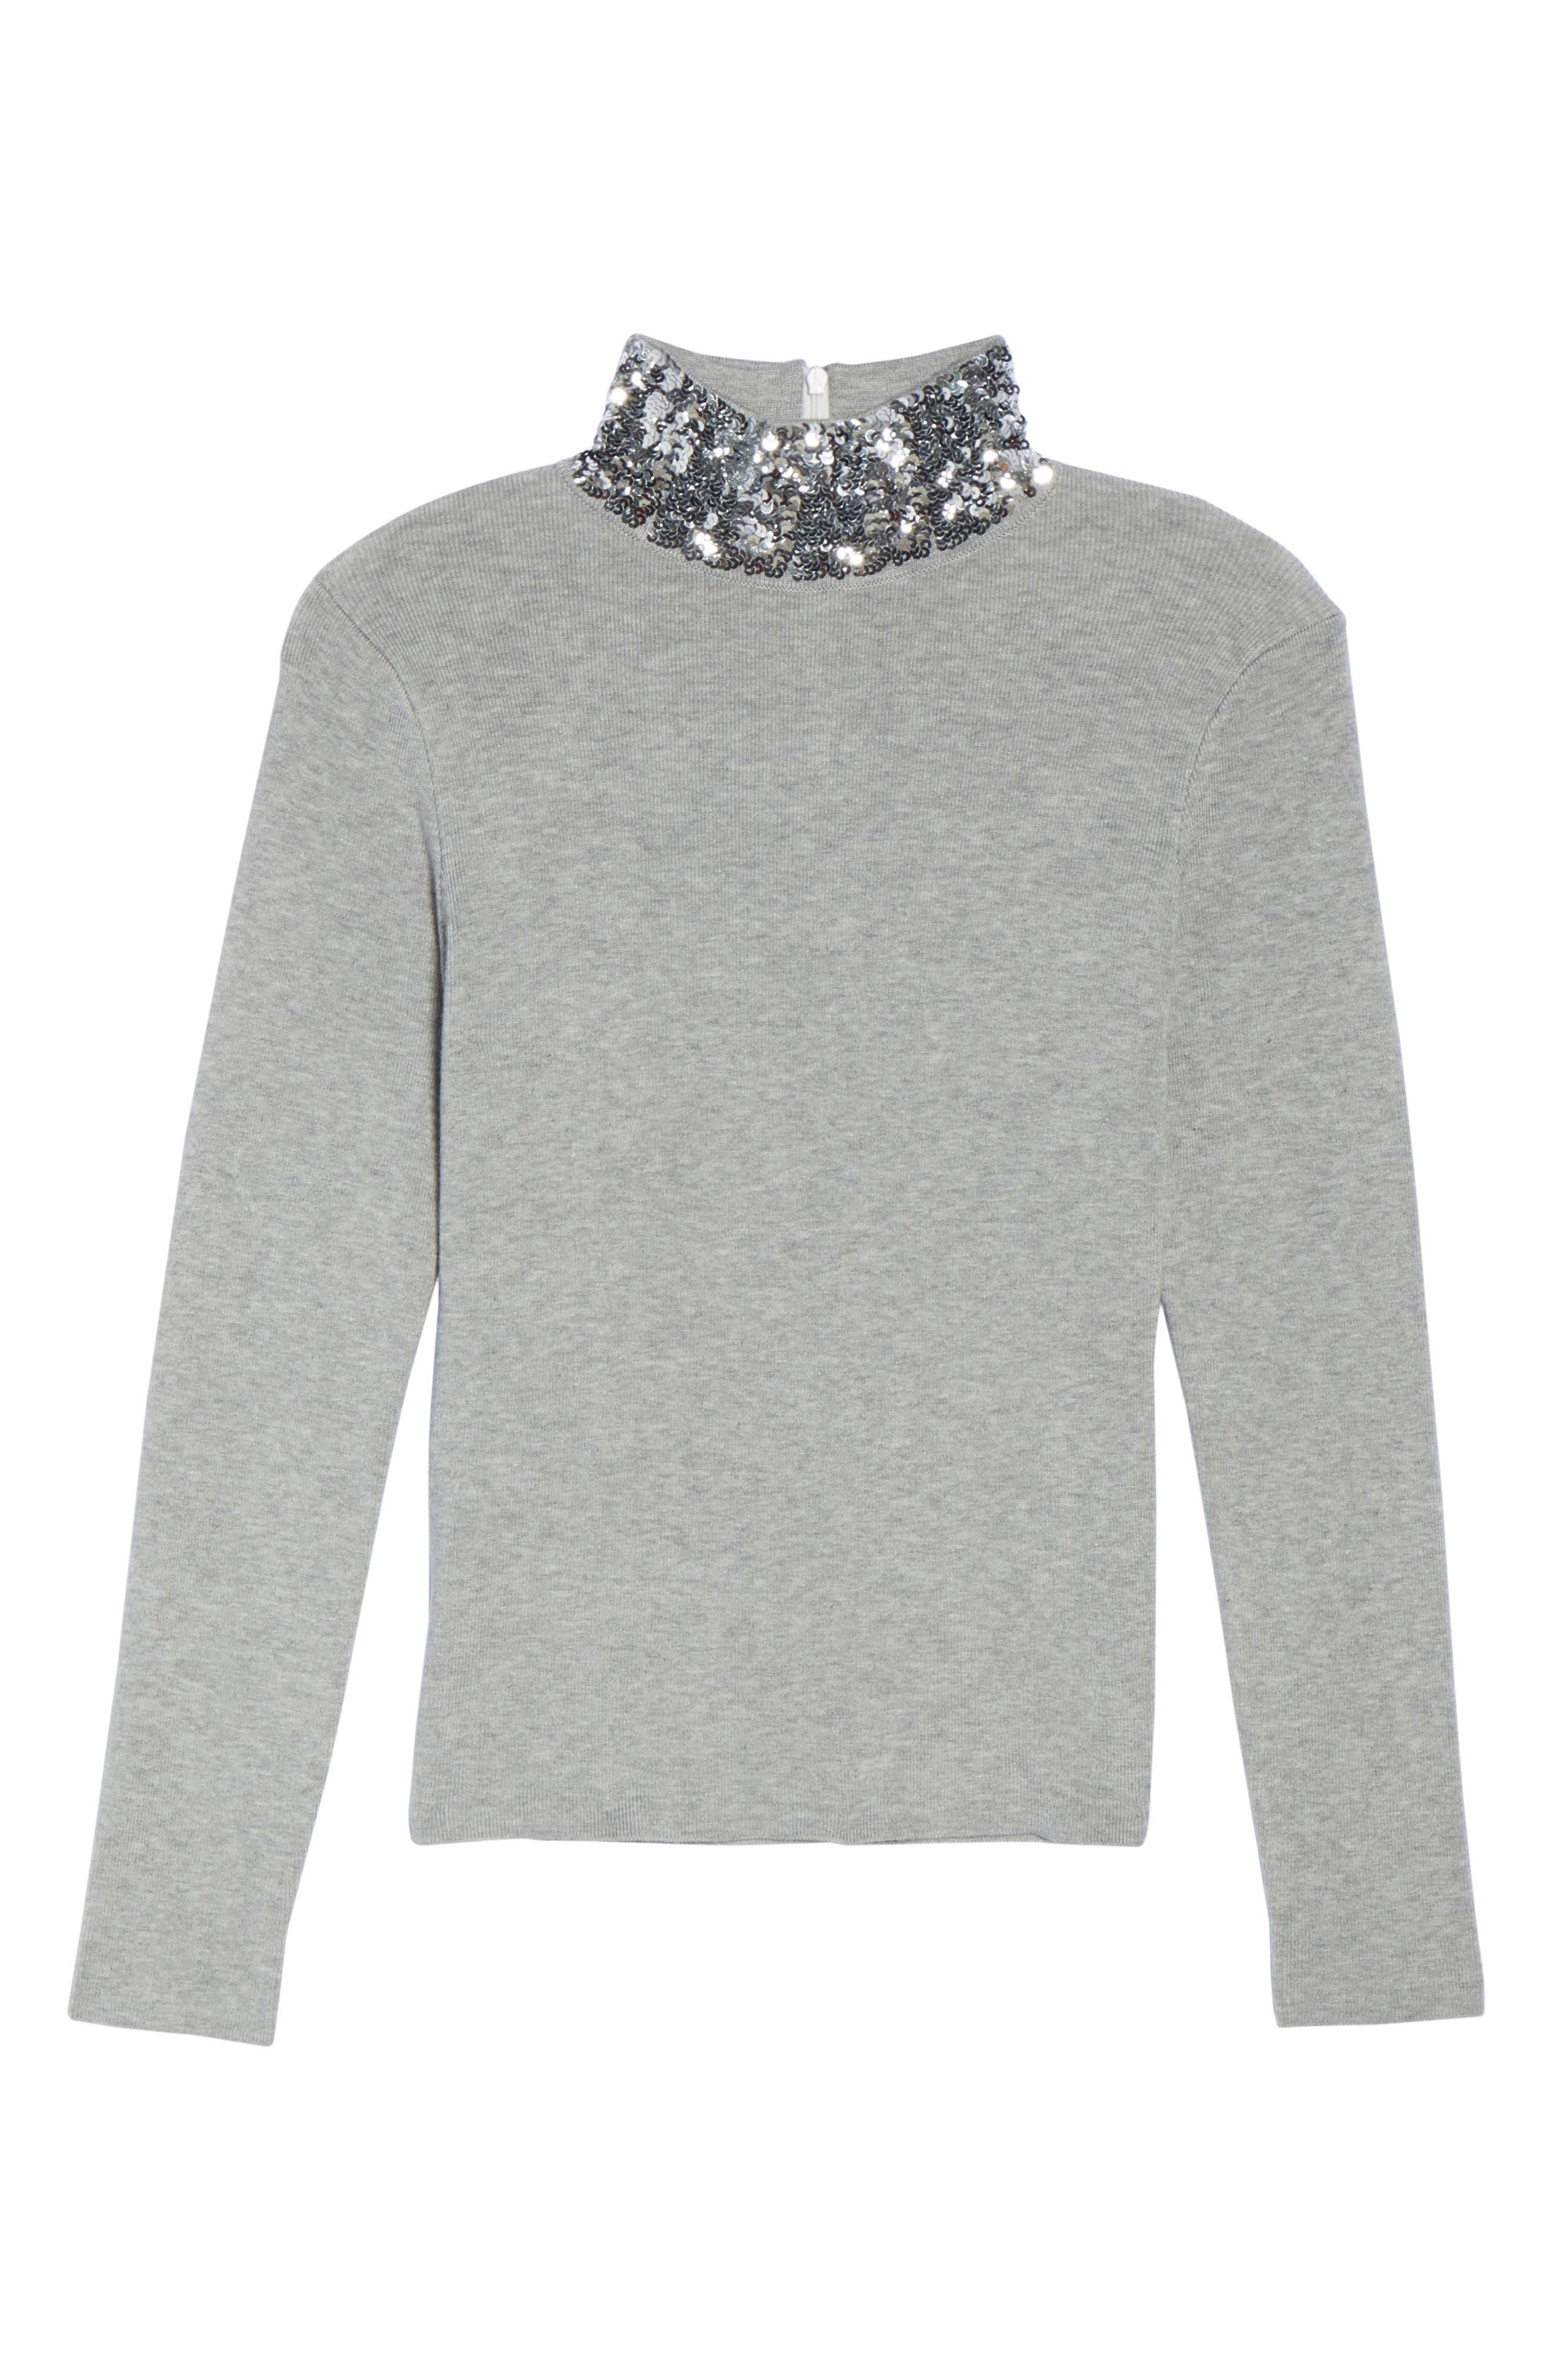 Sequin Mock Neck Sweater,                             Alternate thumbnail 6, color,                             030